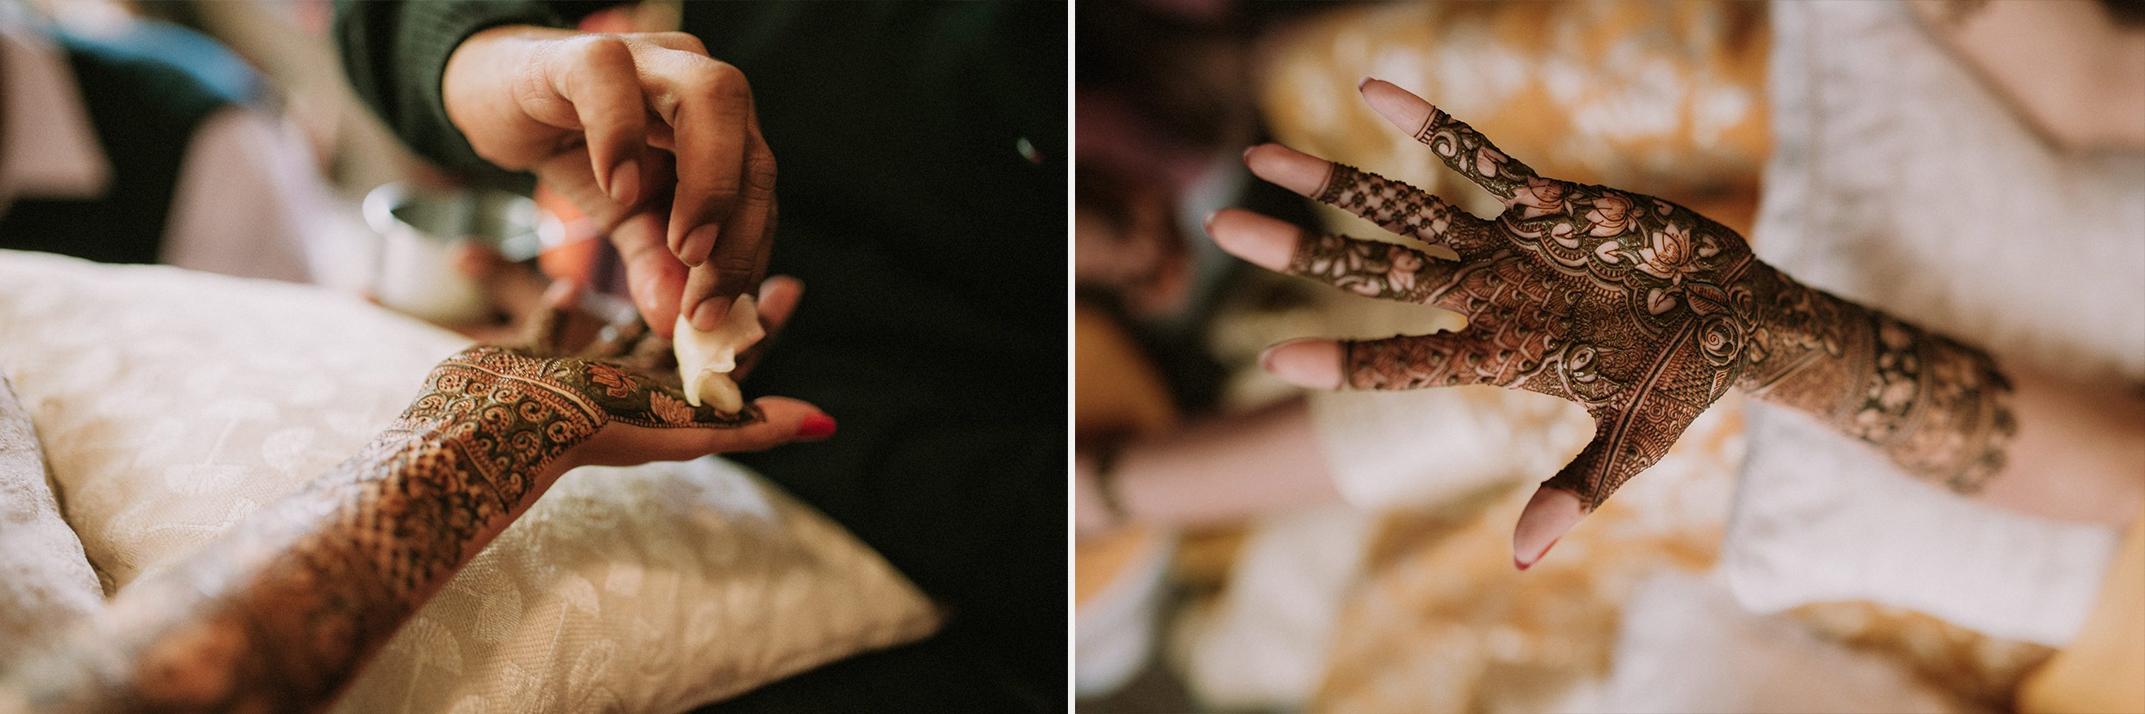 wedding in india - destination wedding photographer-57.jpg